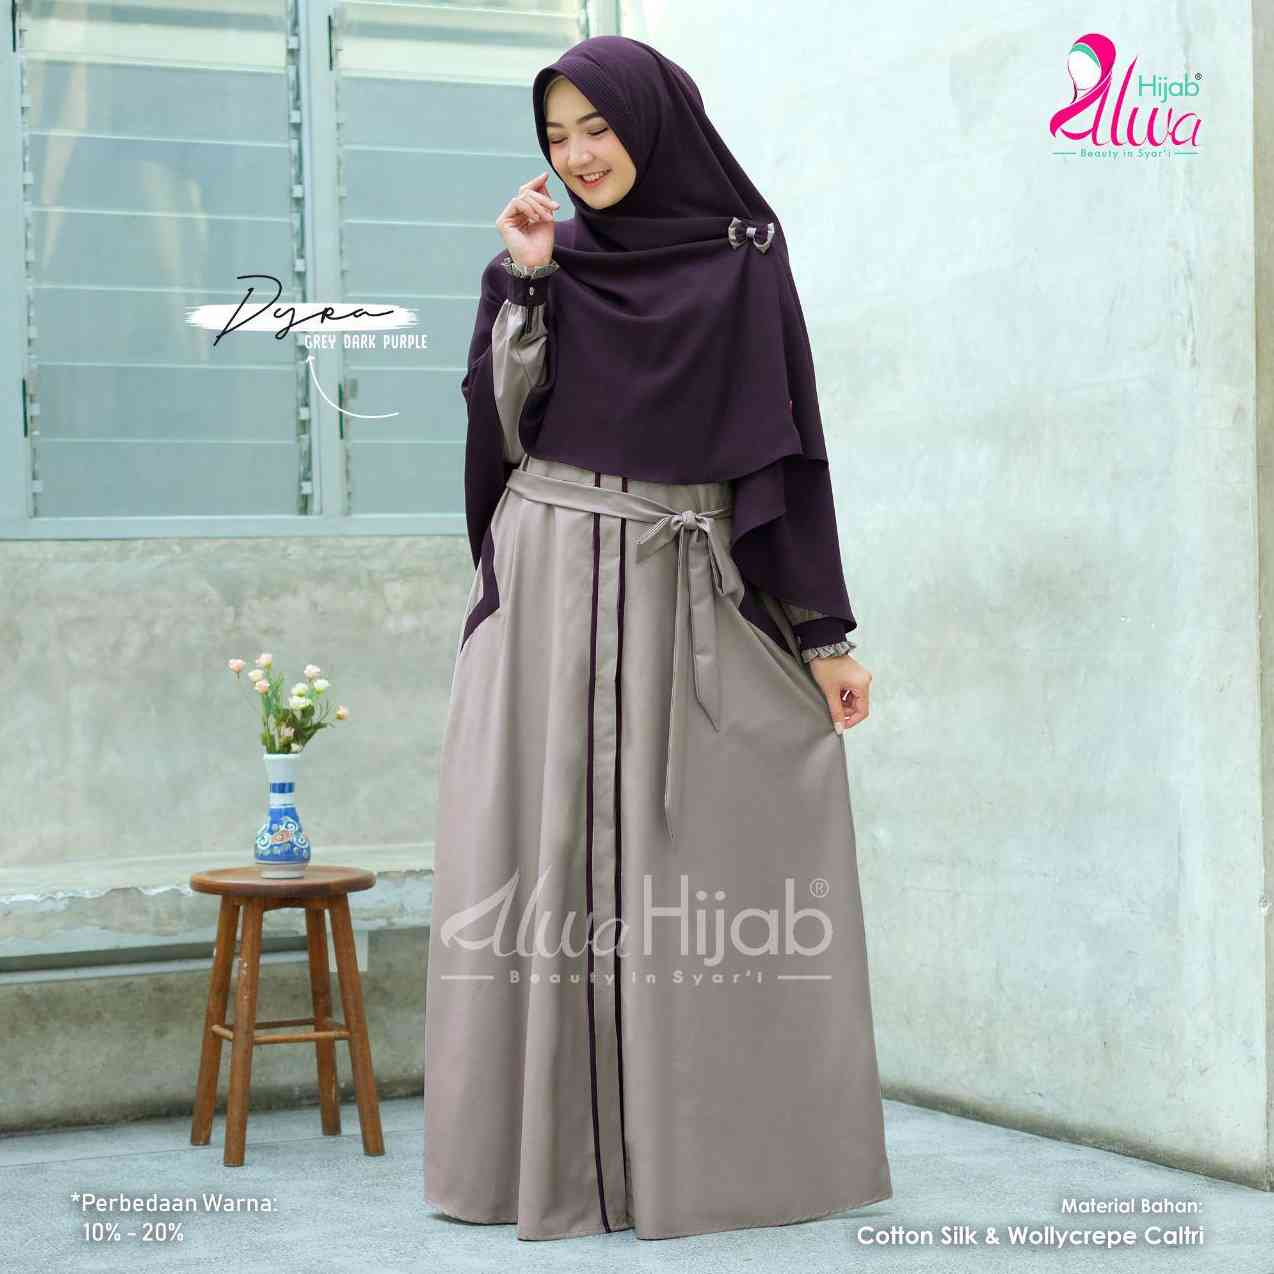 Gerai Olive Hijab Dyra Set By Alwa Hijab